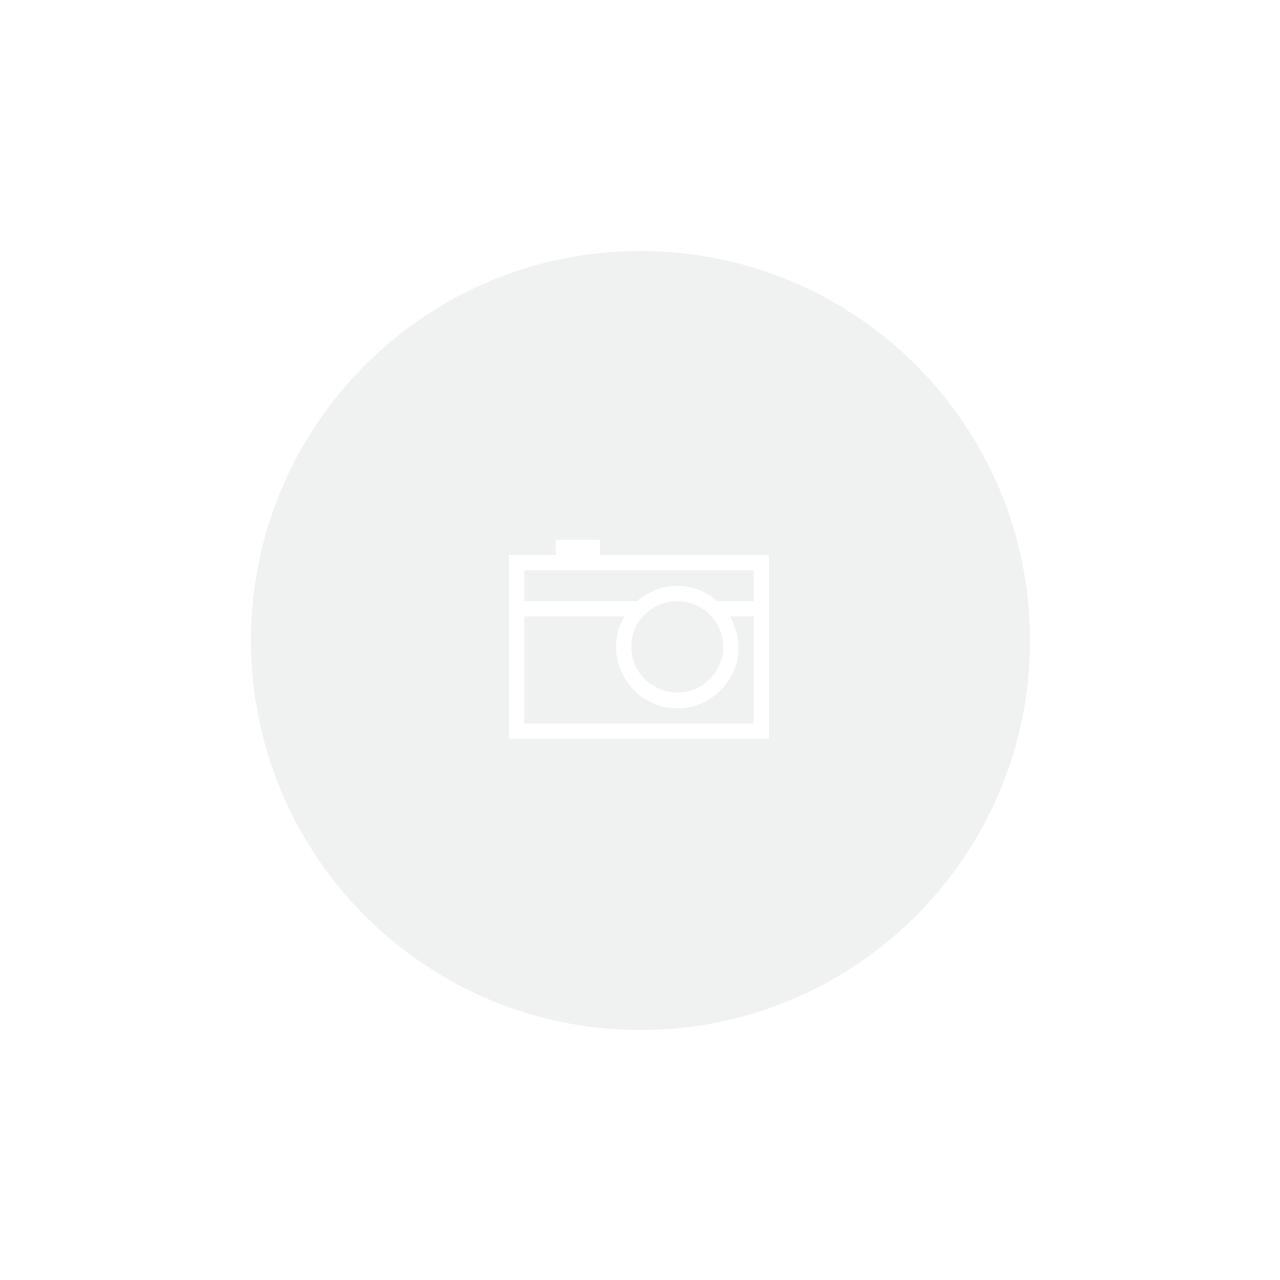 COROA 32D ICTUS NARROW WIDE BCD 94/96mm 4 FUROS (12V)